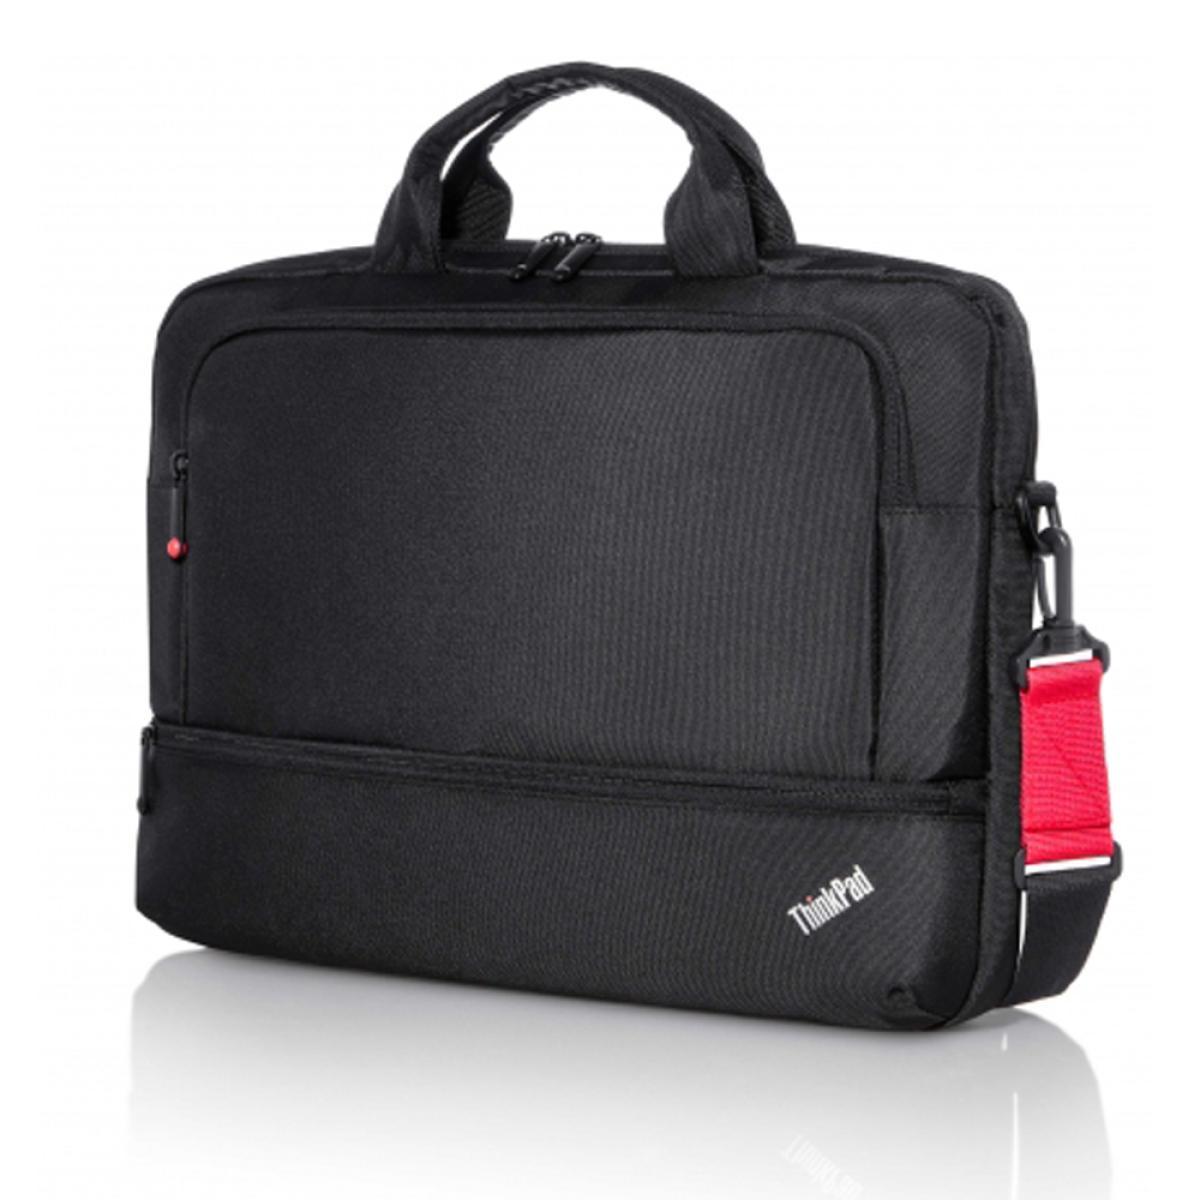 Фото 1. Сумка Lenovo ThinkPad Essential Topload Black (4X40E77328)